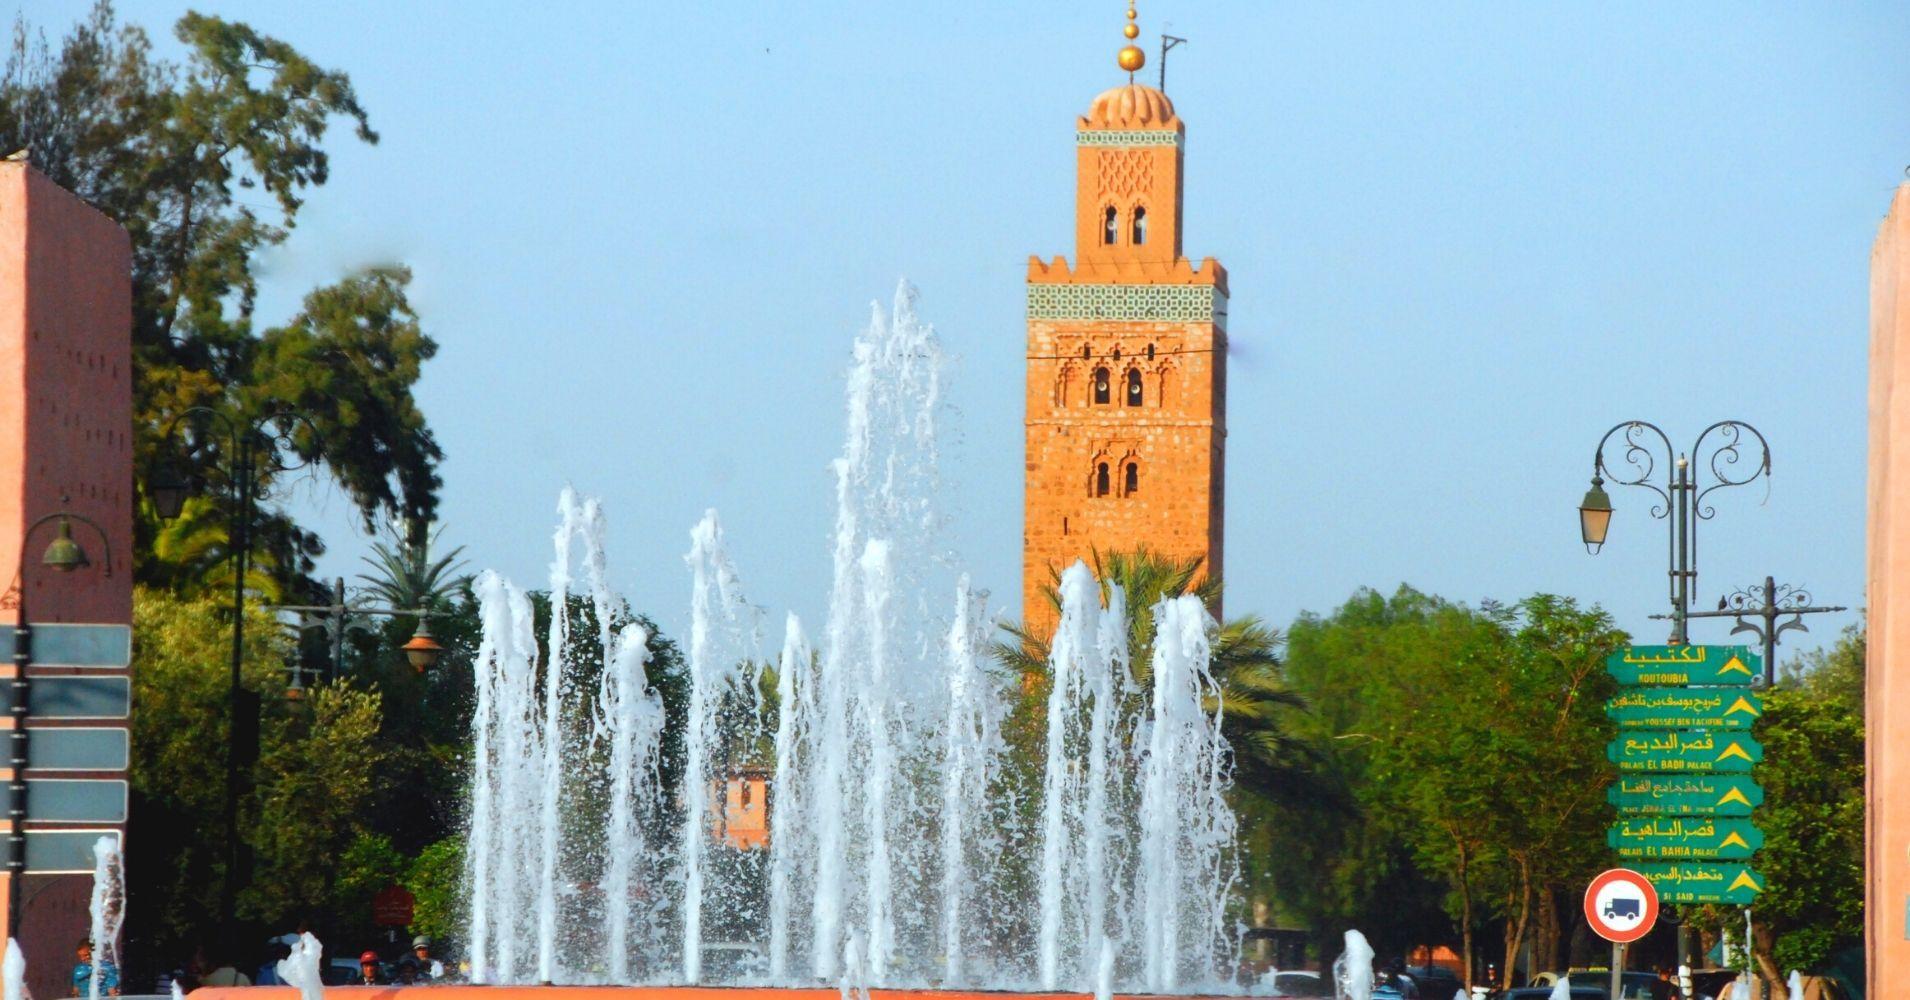 Mezquita de la Kutubia, Marrakech. Marruecos.